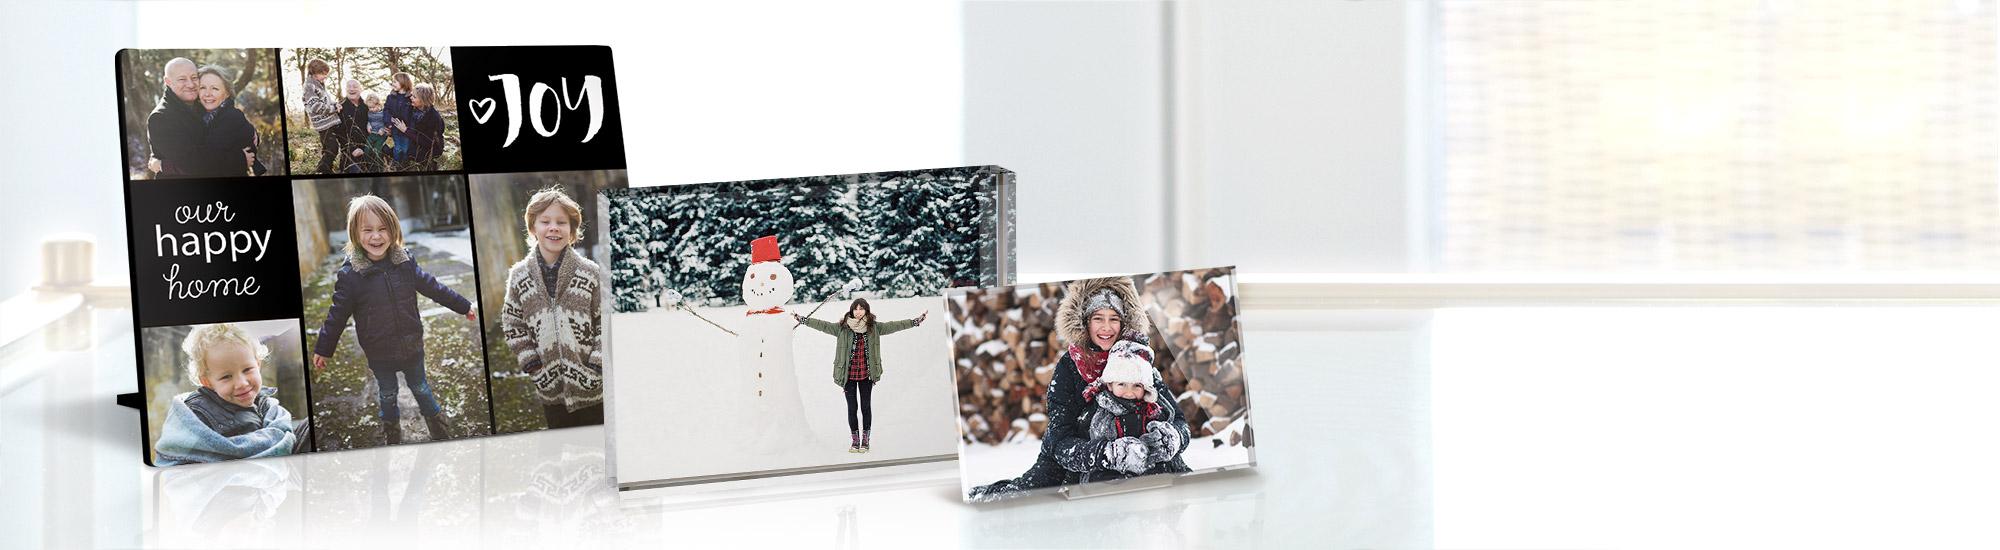 Acrylic Prints & Photo Panels